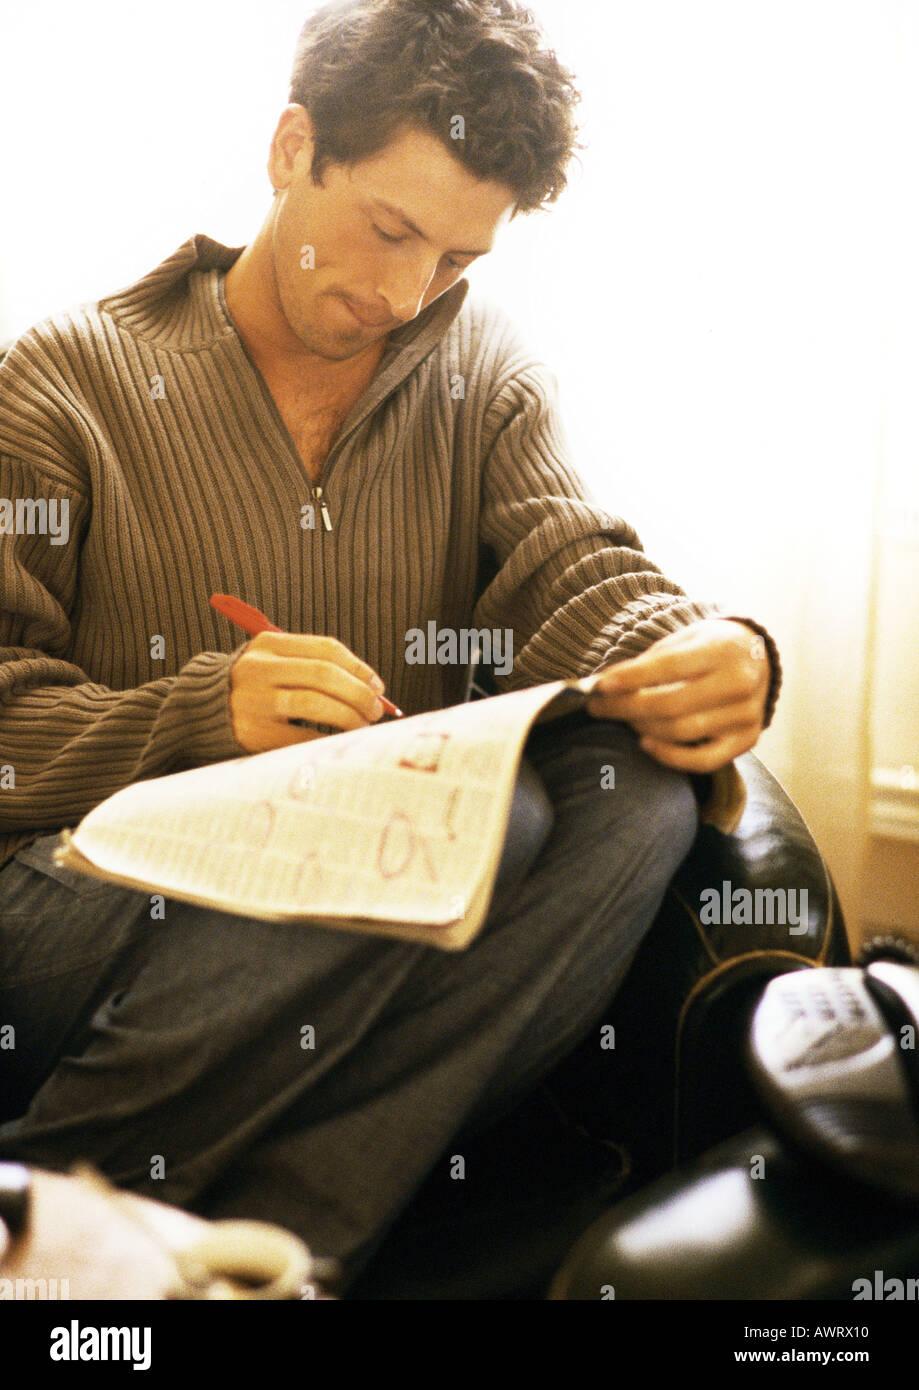 Man writing on newspaper - Stock Image